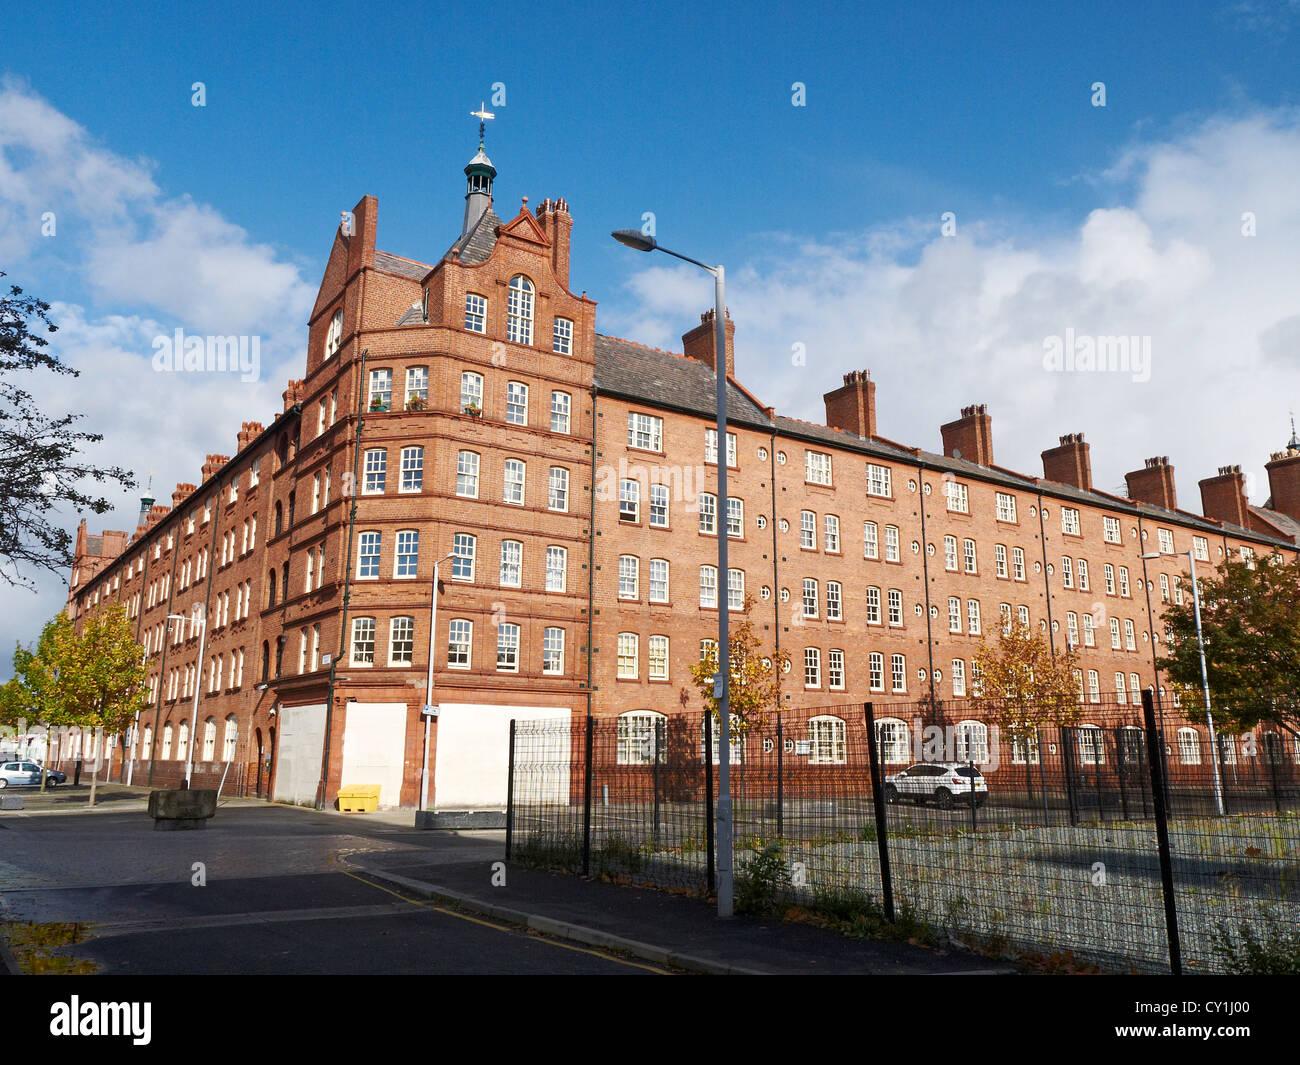 Victoria buildings on Sherratt Street in Ancoats Manchester UK - Stock Image